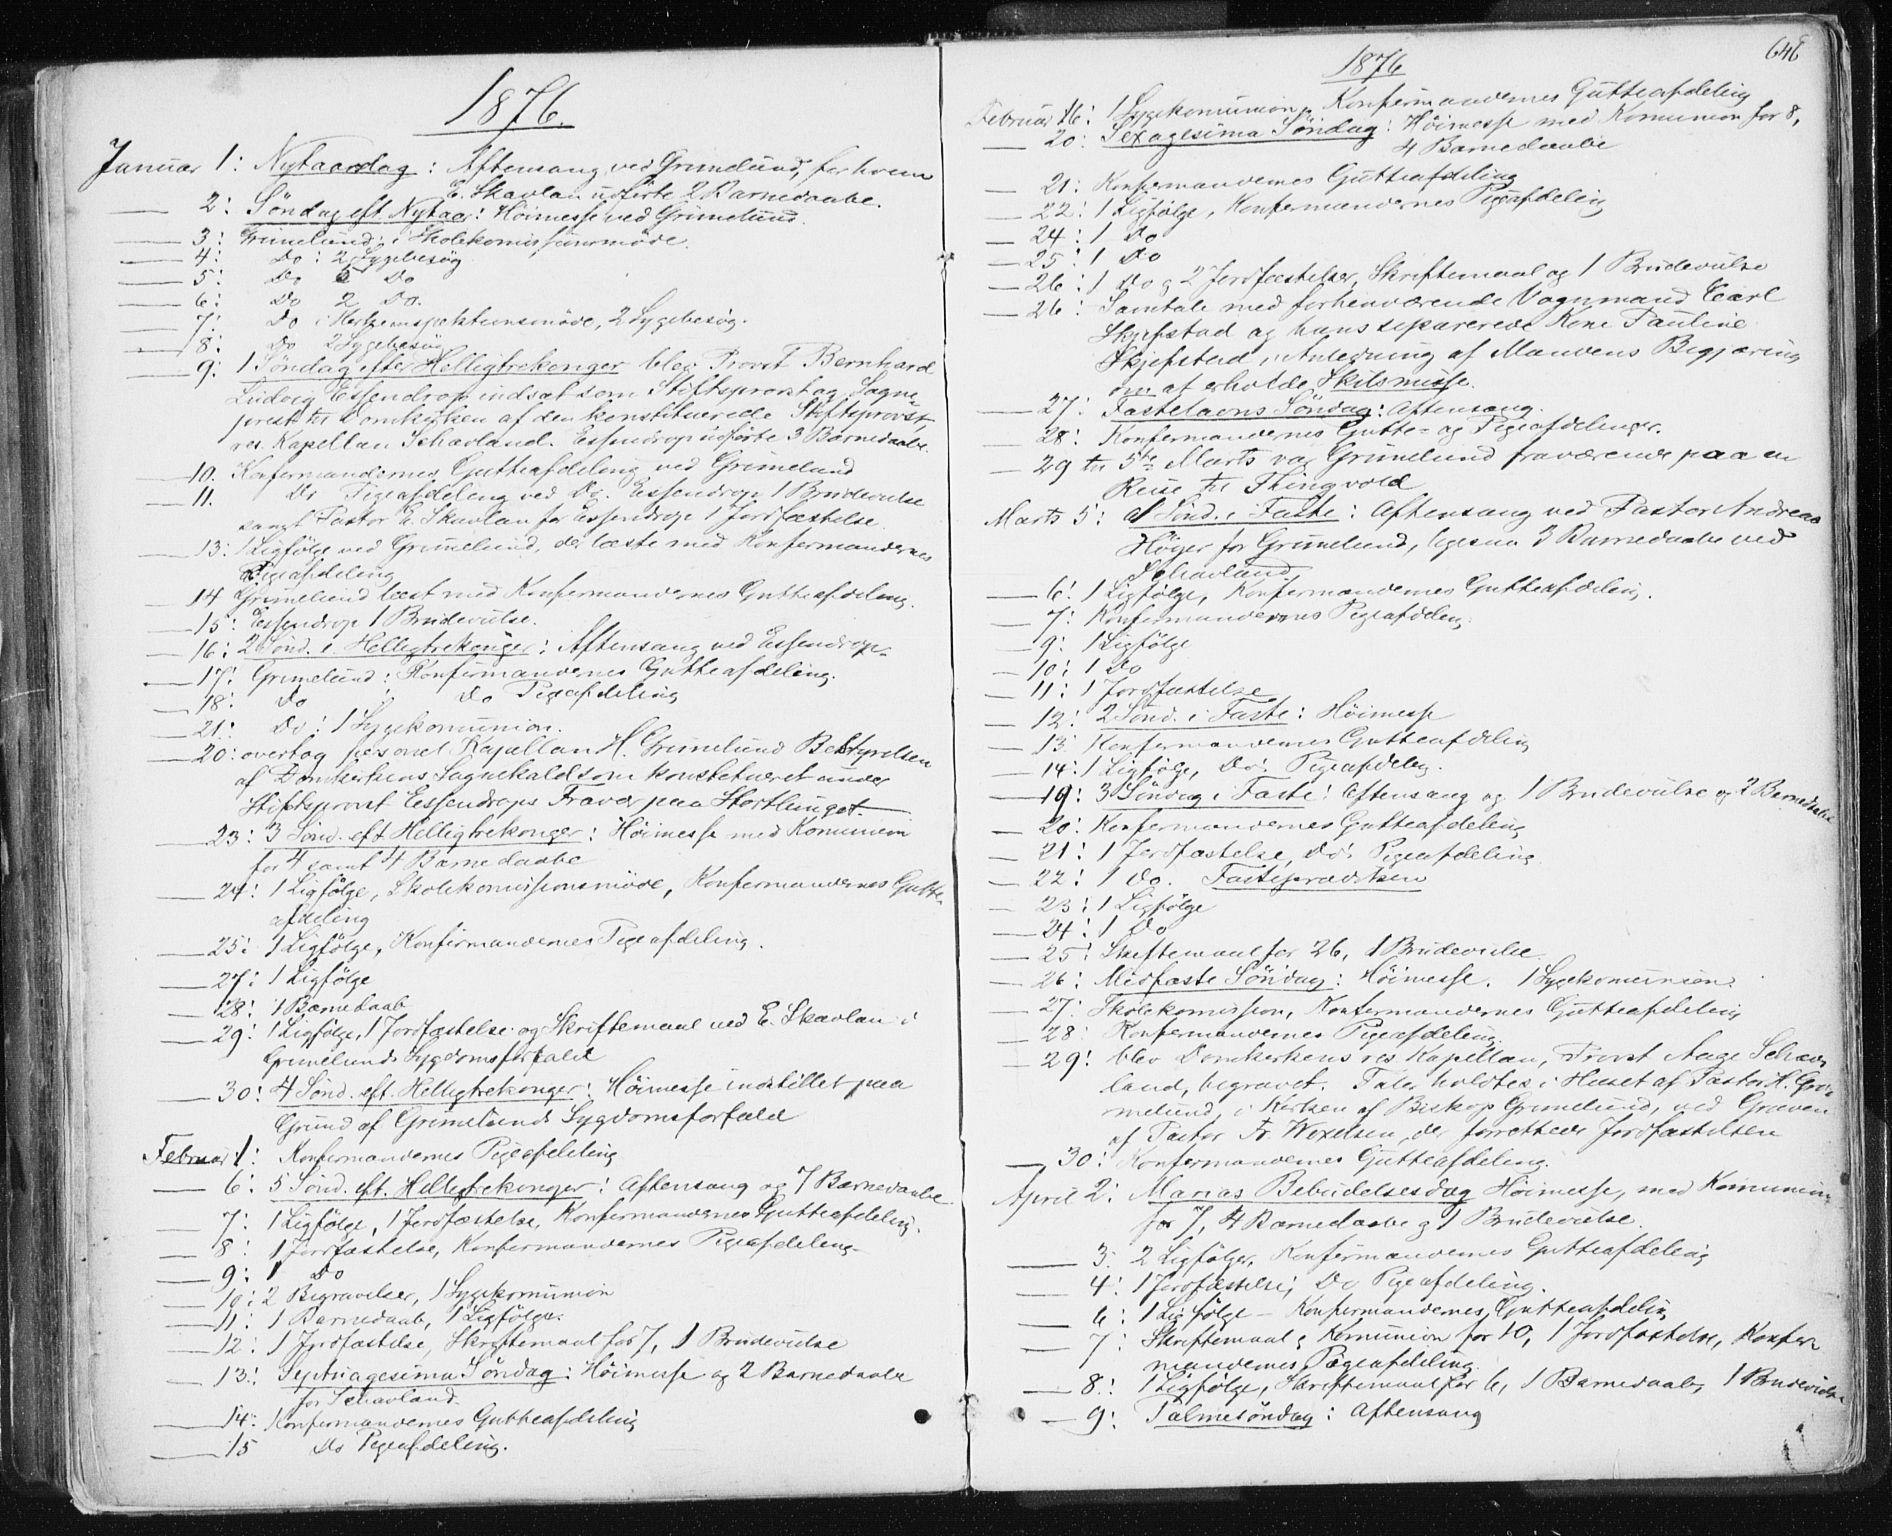 SAT, Ministerialprotokoller, klokkerbøker og fødselsregistre - Sør-Trøndelag, 601/L0055: Parish register (official) no. 601A23, 1866-1877, p. 646